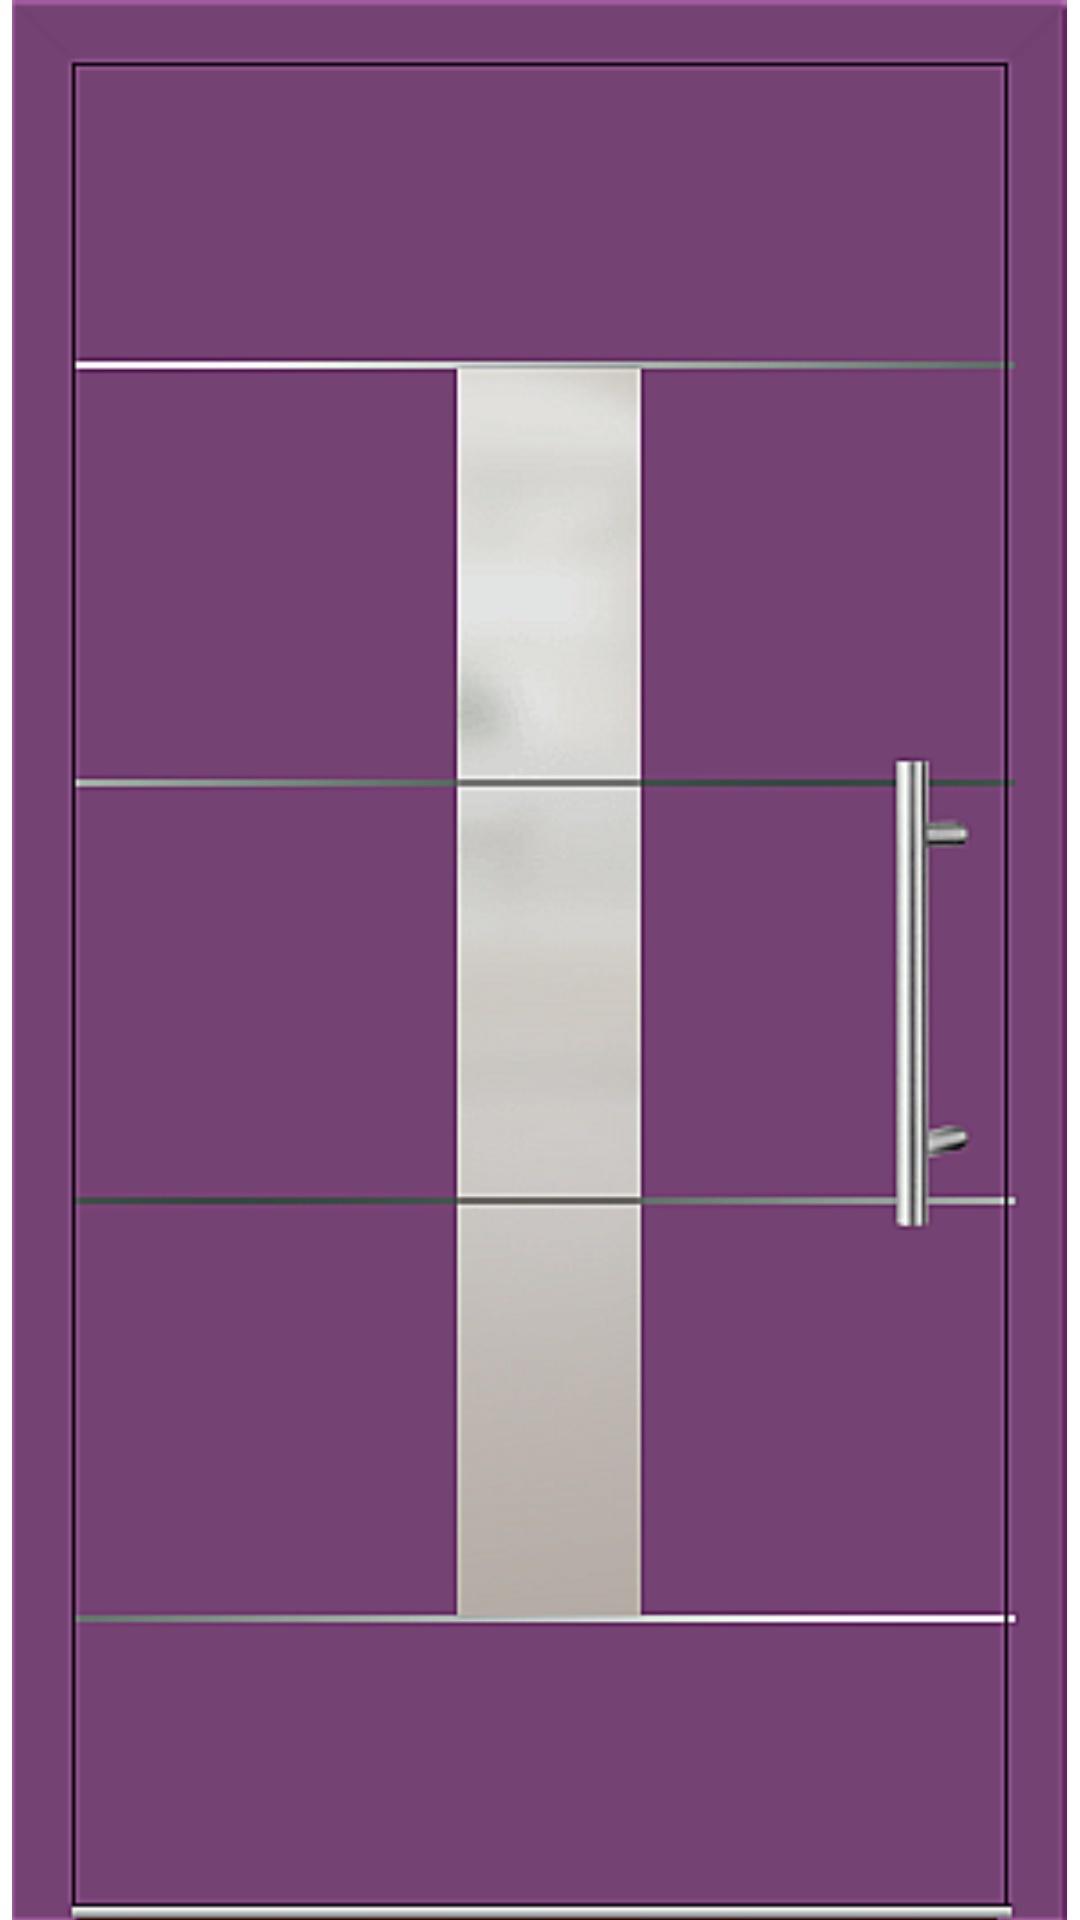 Kunststoff Haustür Modell 6184-54 singalviolett